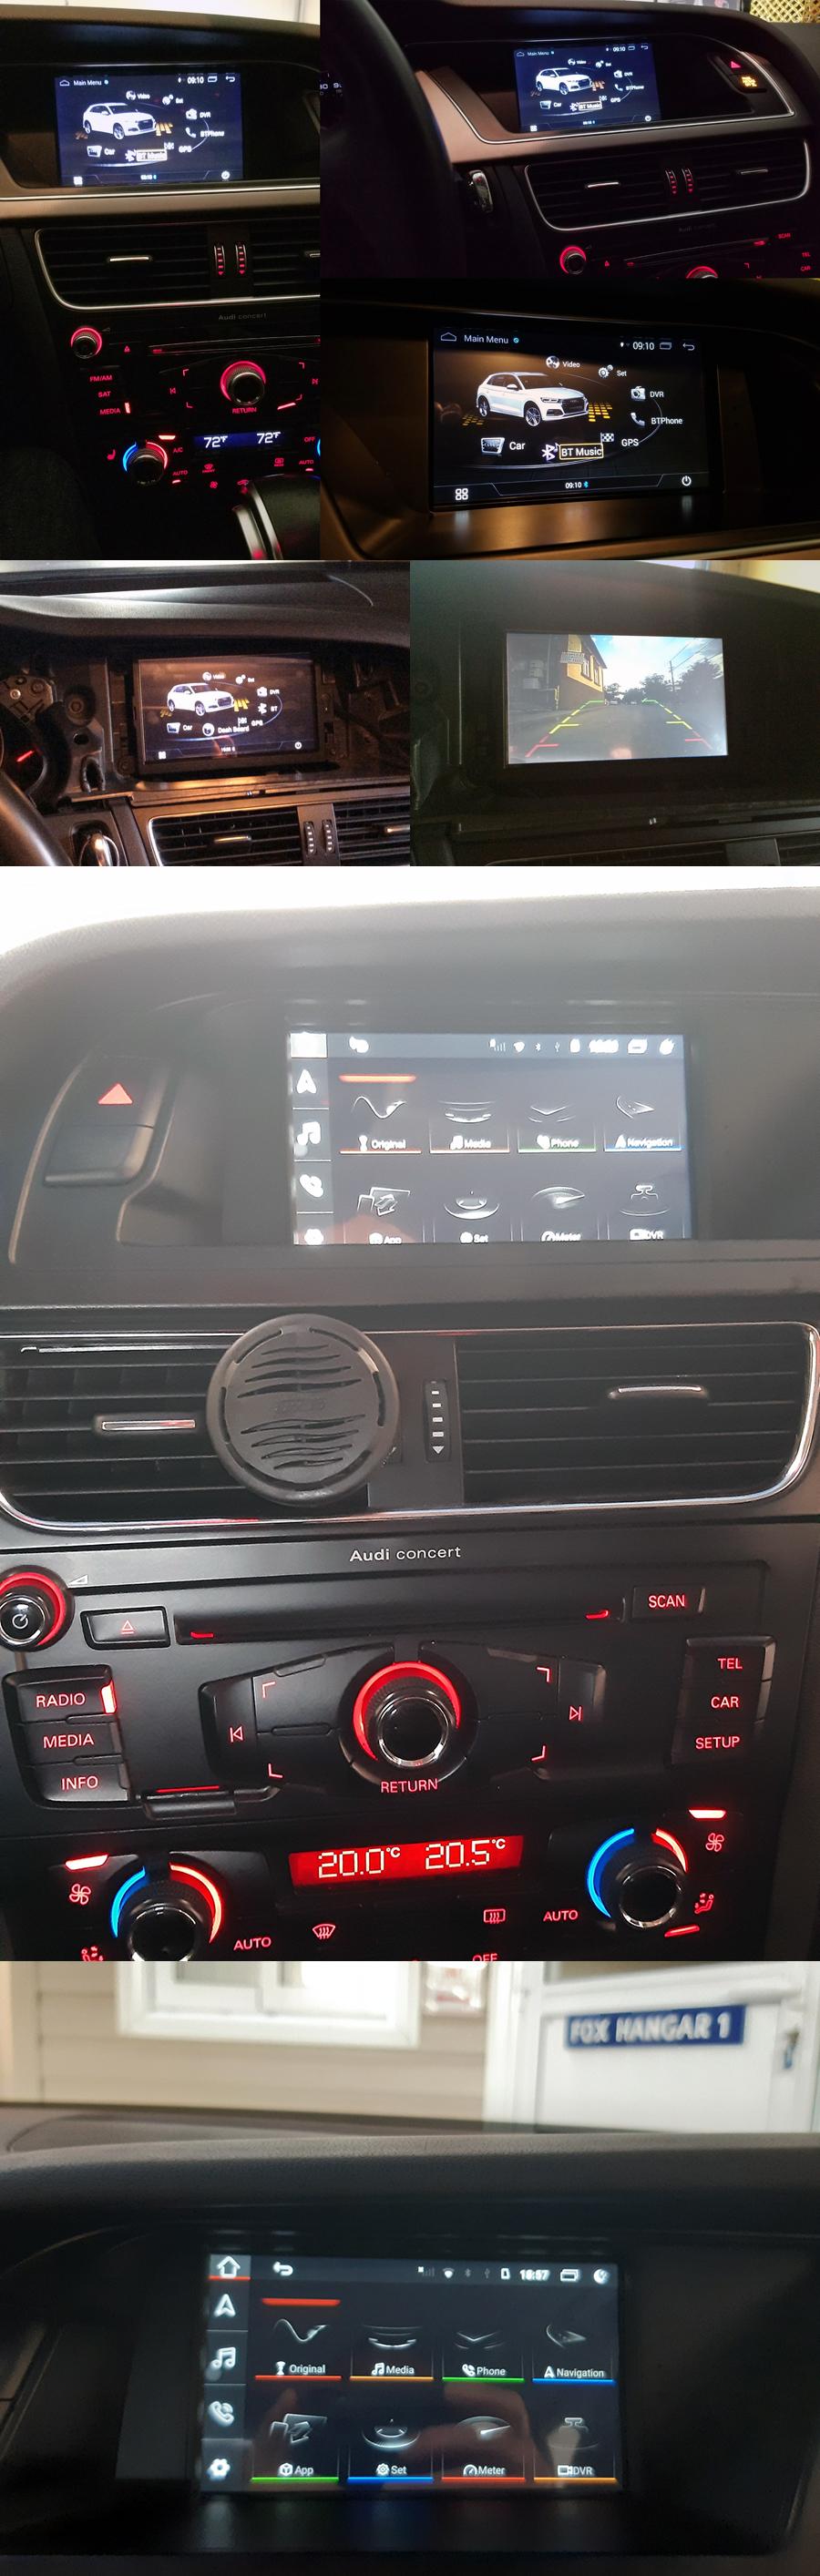 wiring diagram for car stereo installation 2004 pontiac vibe radio audi q5 gps navigation (2008-2016)